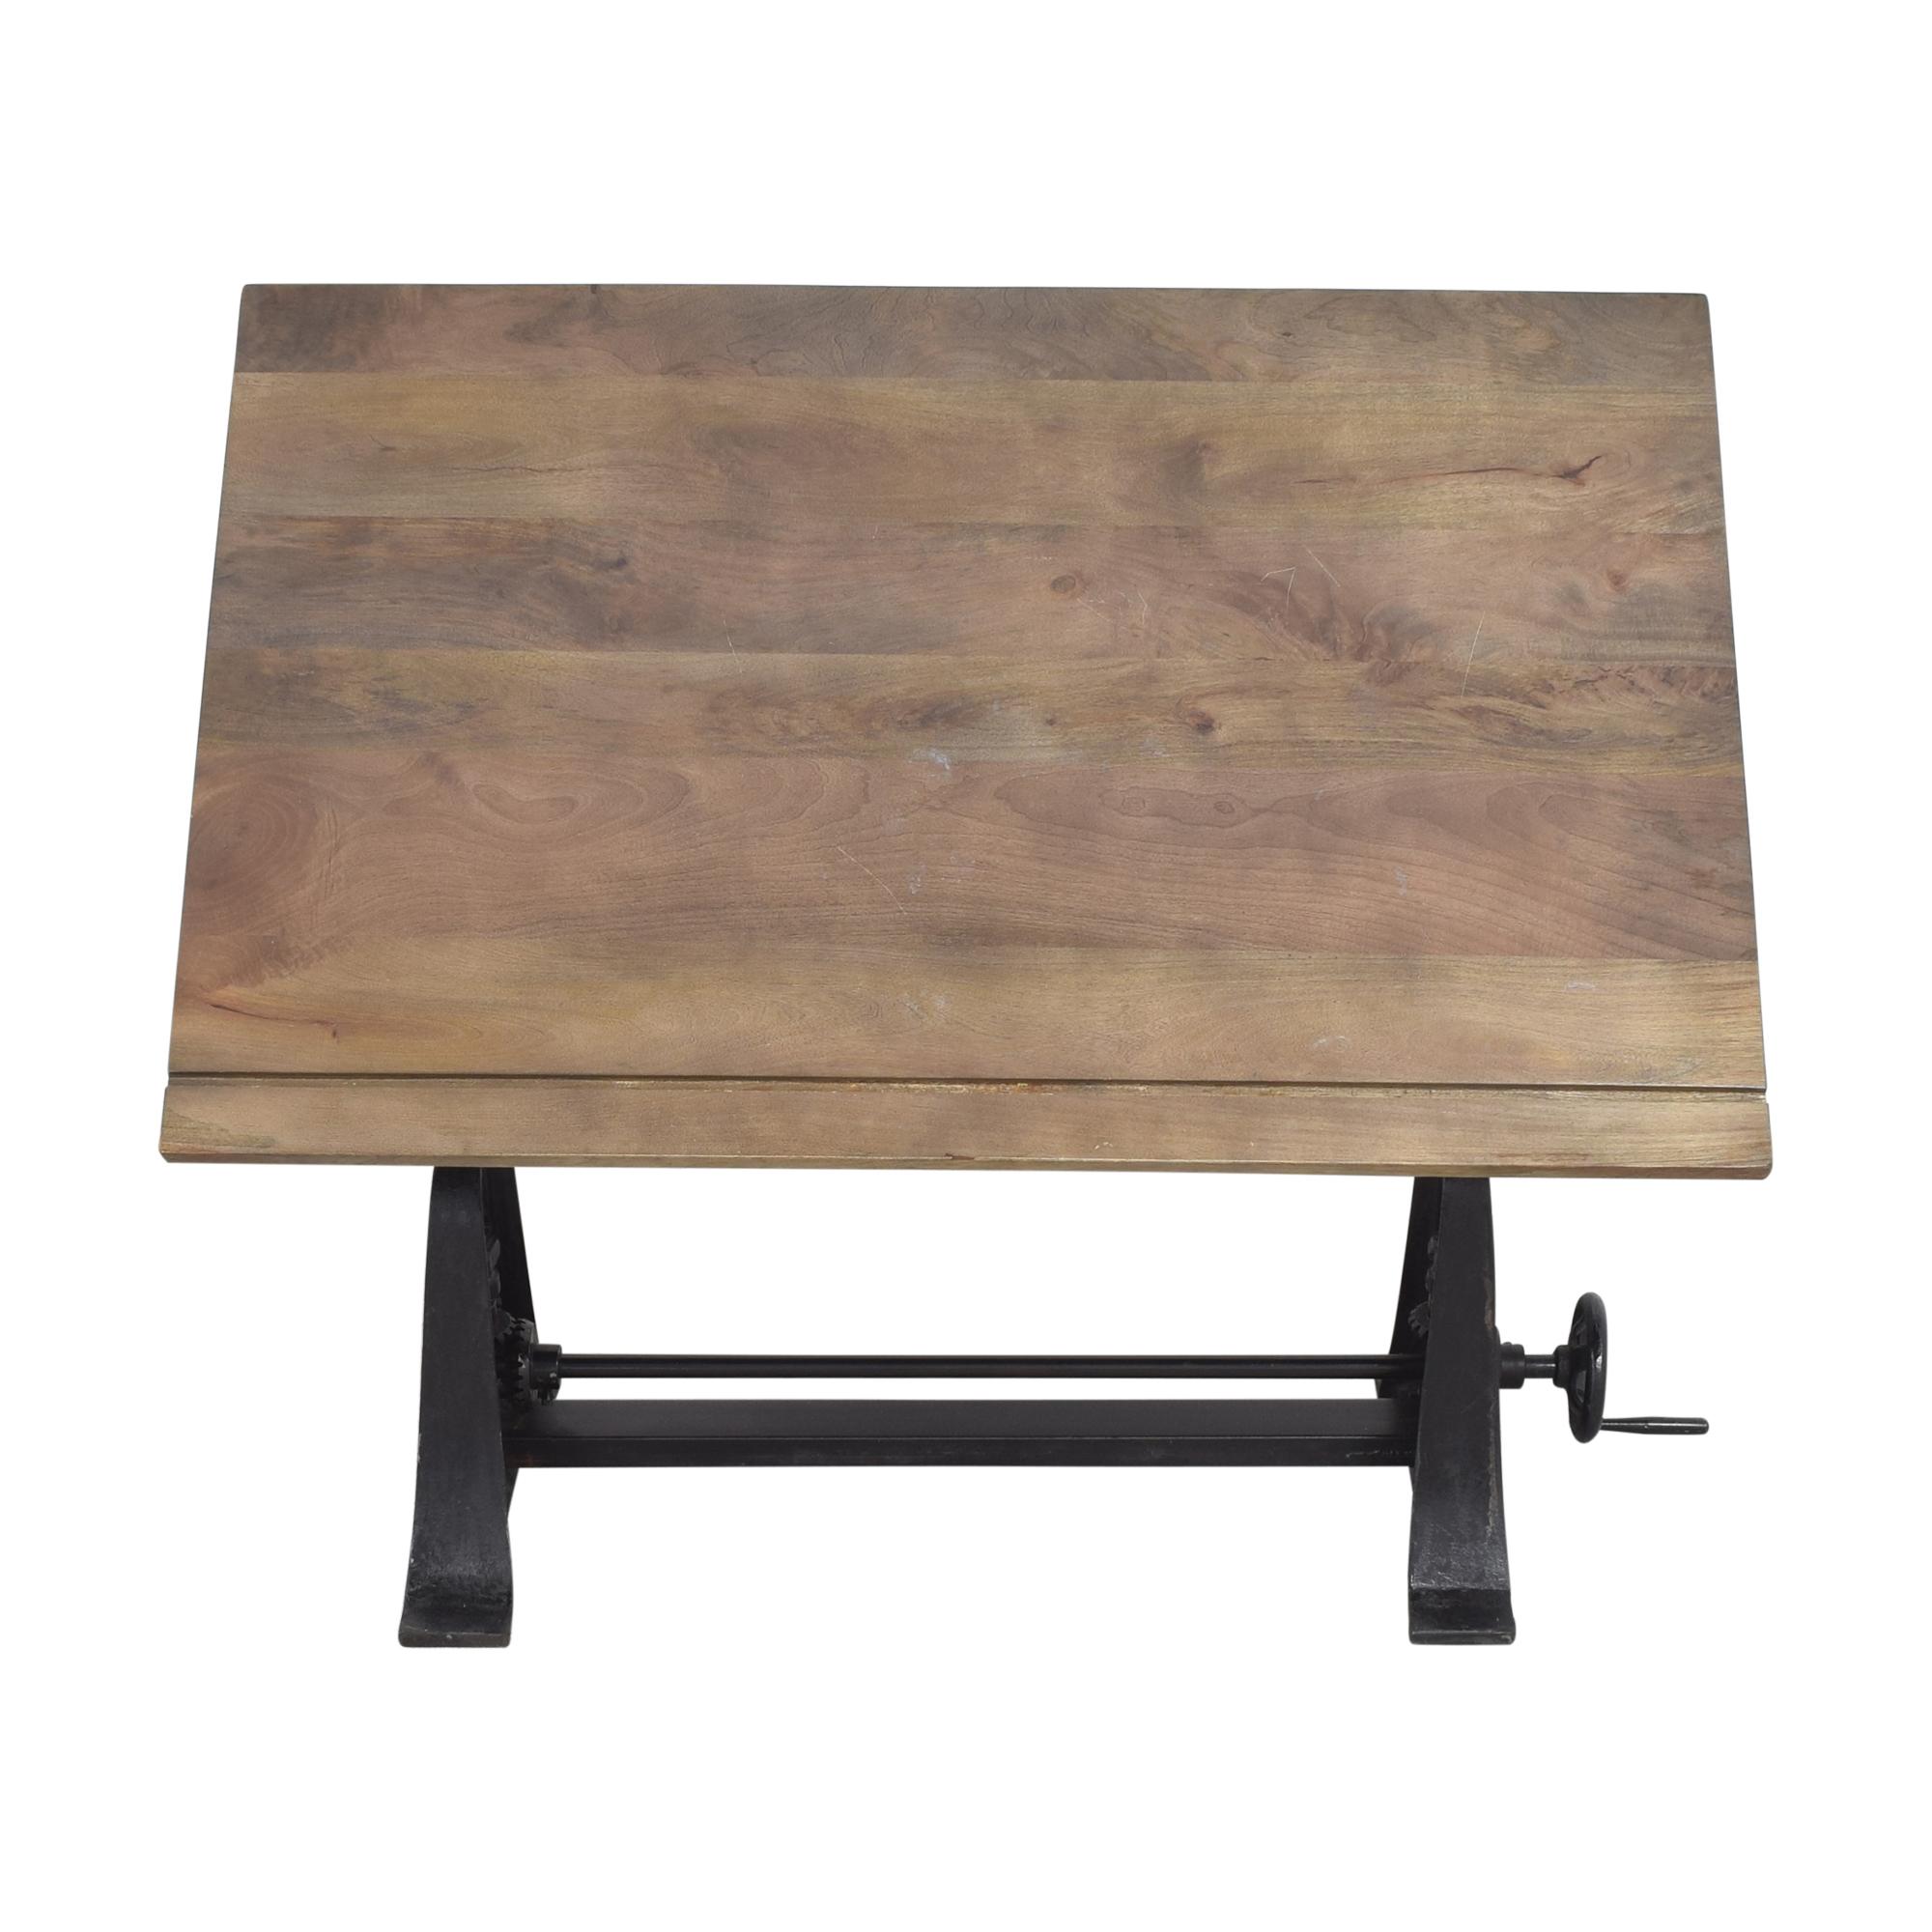 buy Restoration Hardware 1910 American Trestle Drafting Table Restoration Hardware